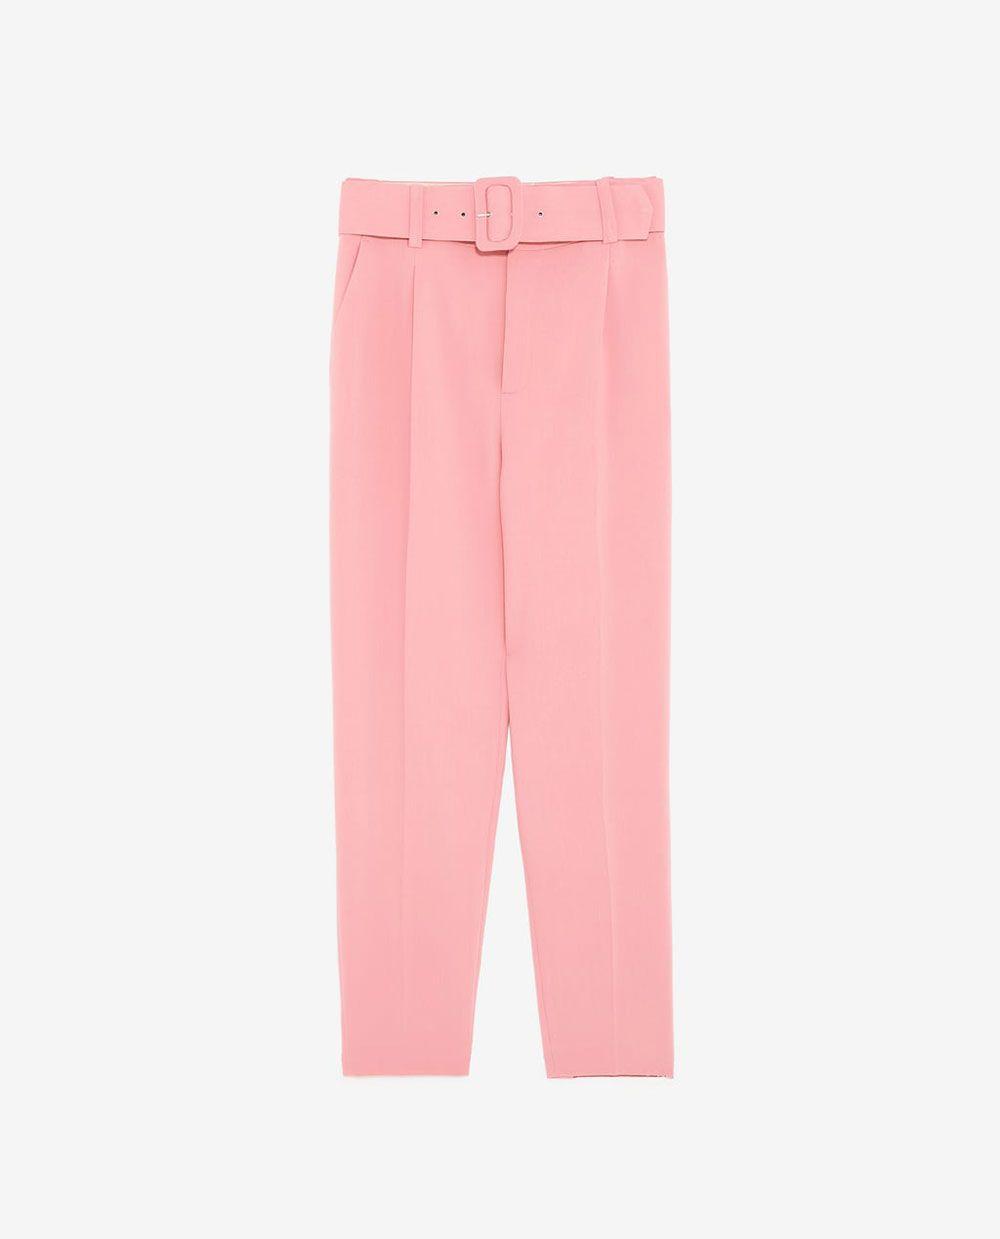 I Zara L'estate Rodriguez Rosa Cecilia 2018 Di E Pantaloni Per Qrstdh